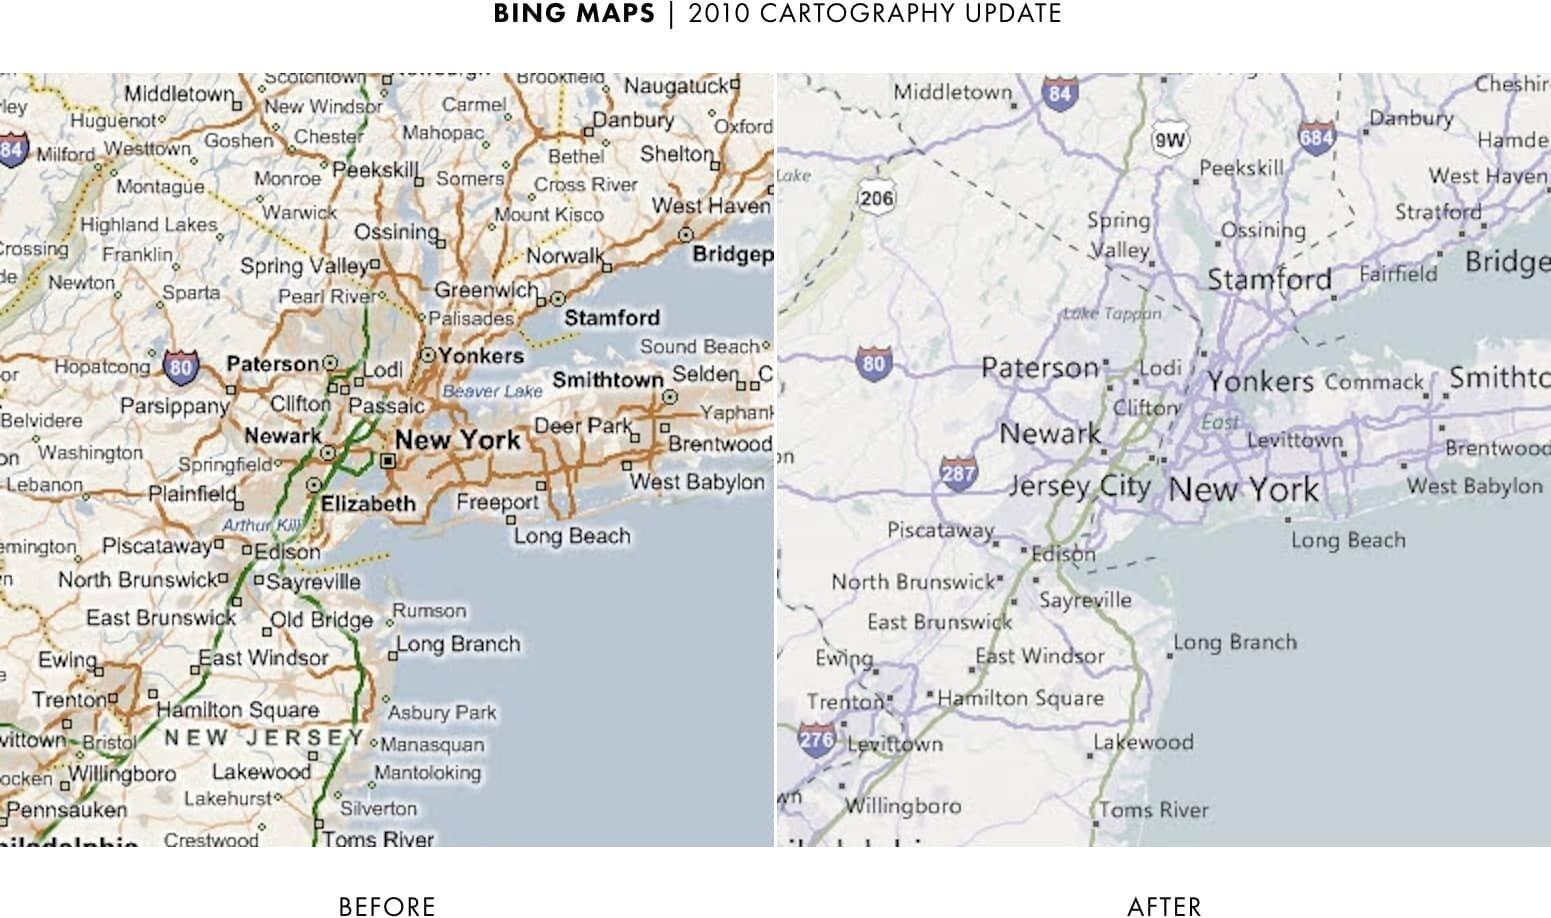 2 Cartography Change - Bing Maps 2010.jpg